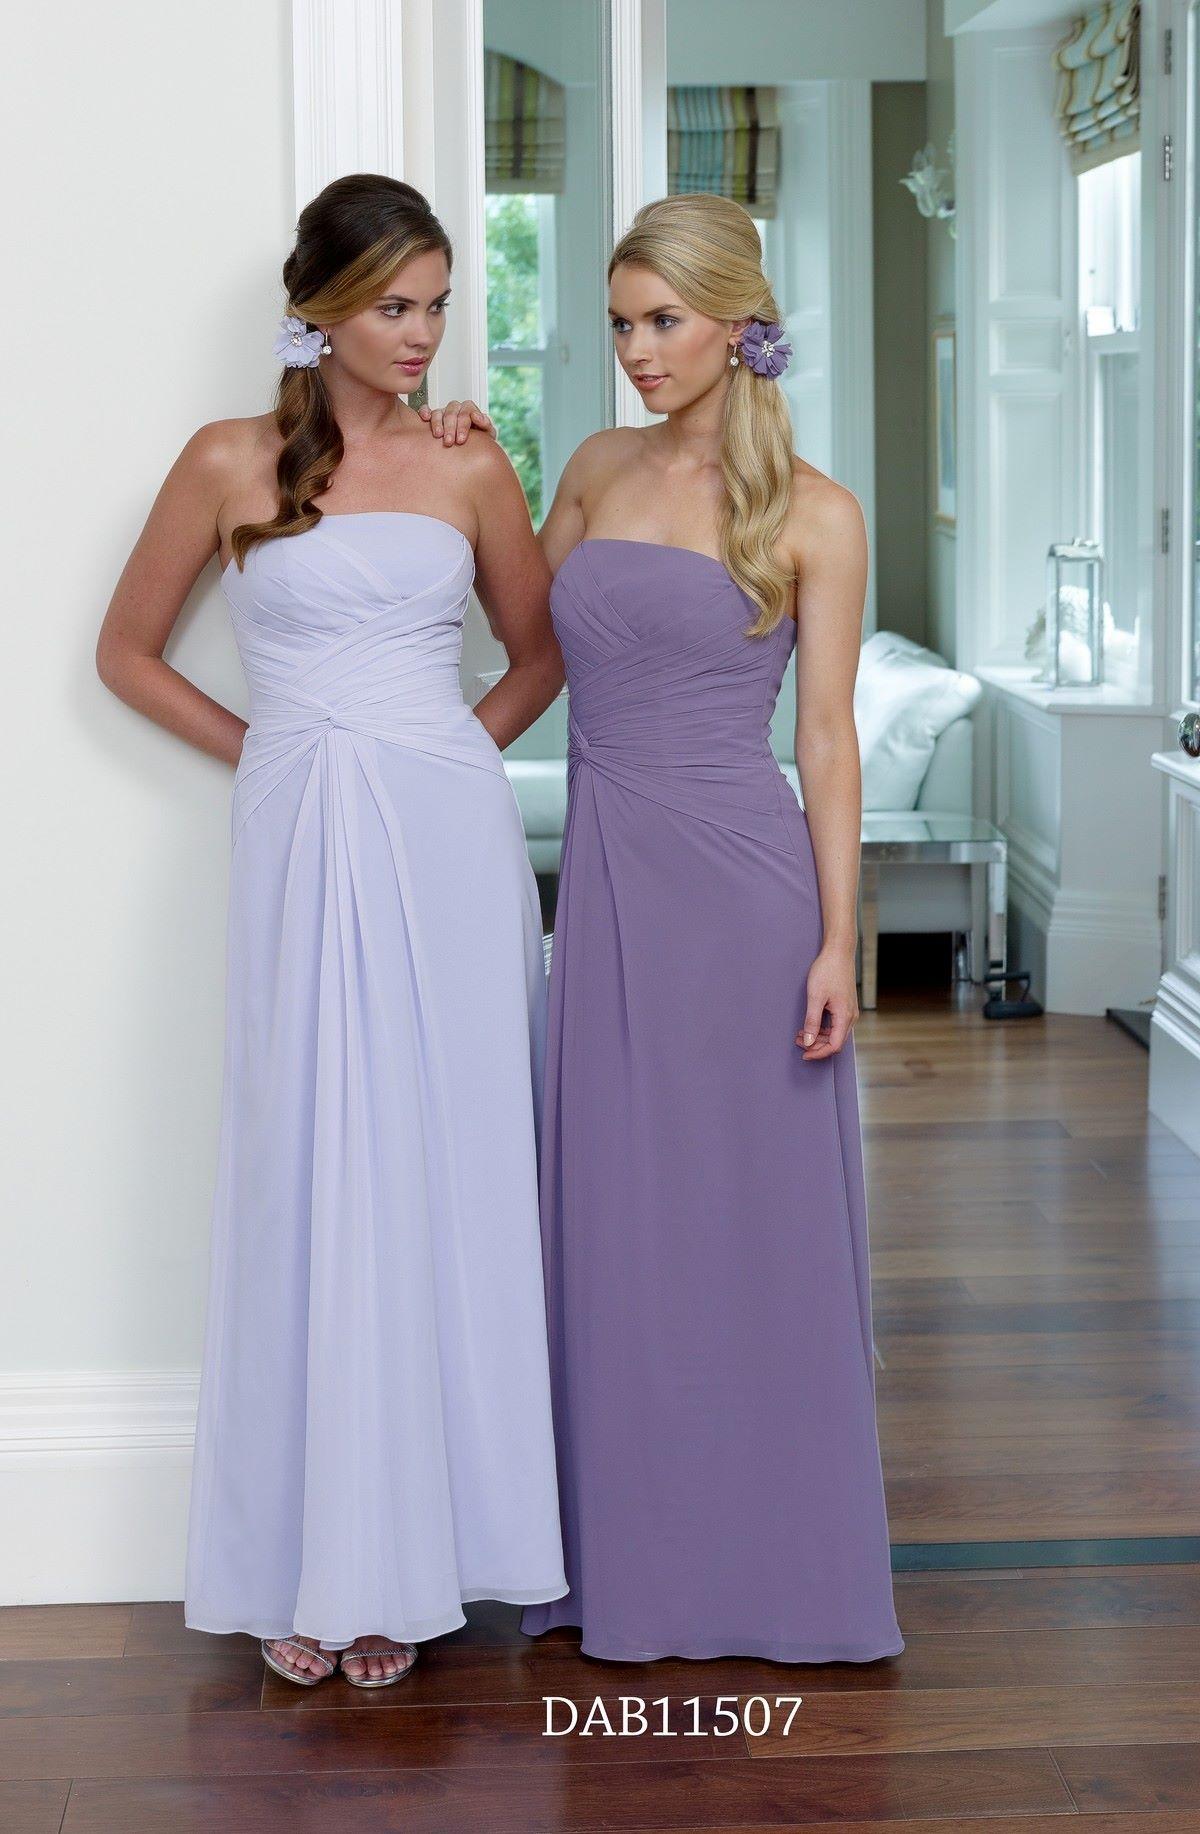 BM Sale Dress - DAB11507